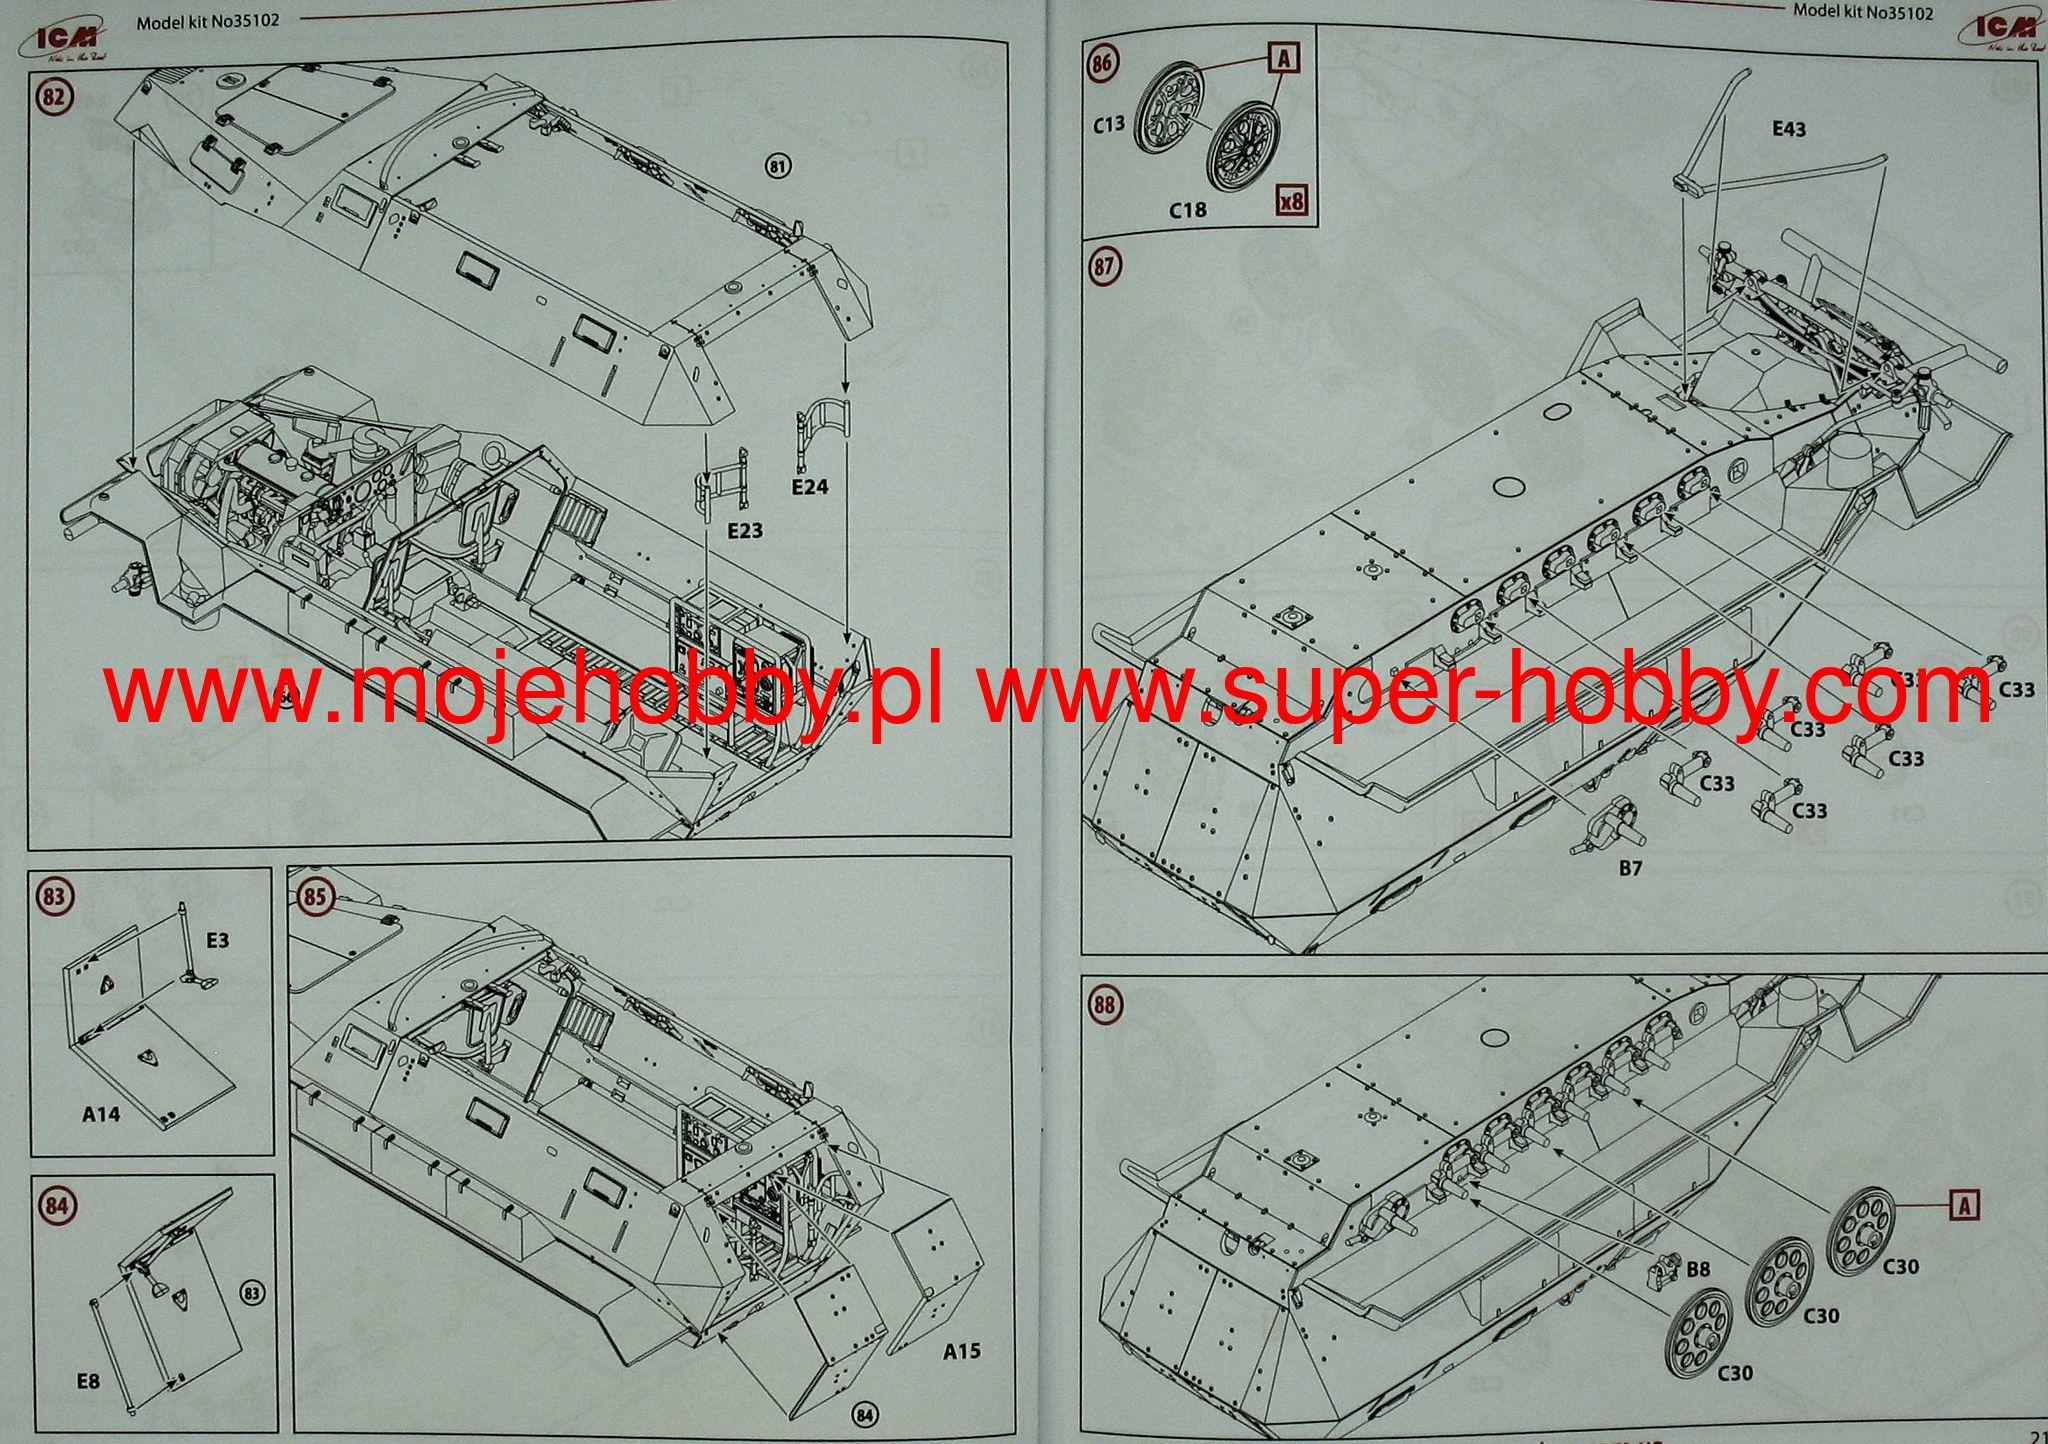 icm 251 wiring diagram online wiring diagram dataicm 251 wiring diagram wiring schematic diagram